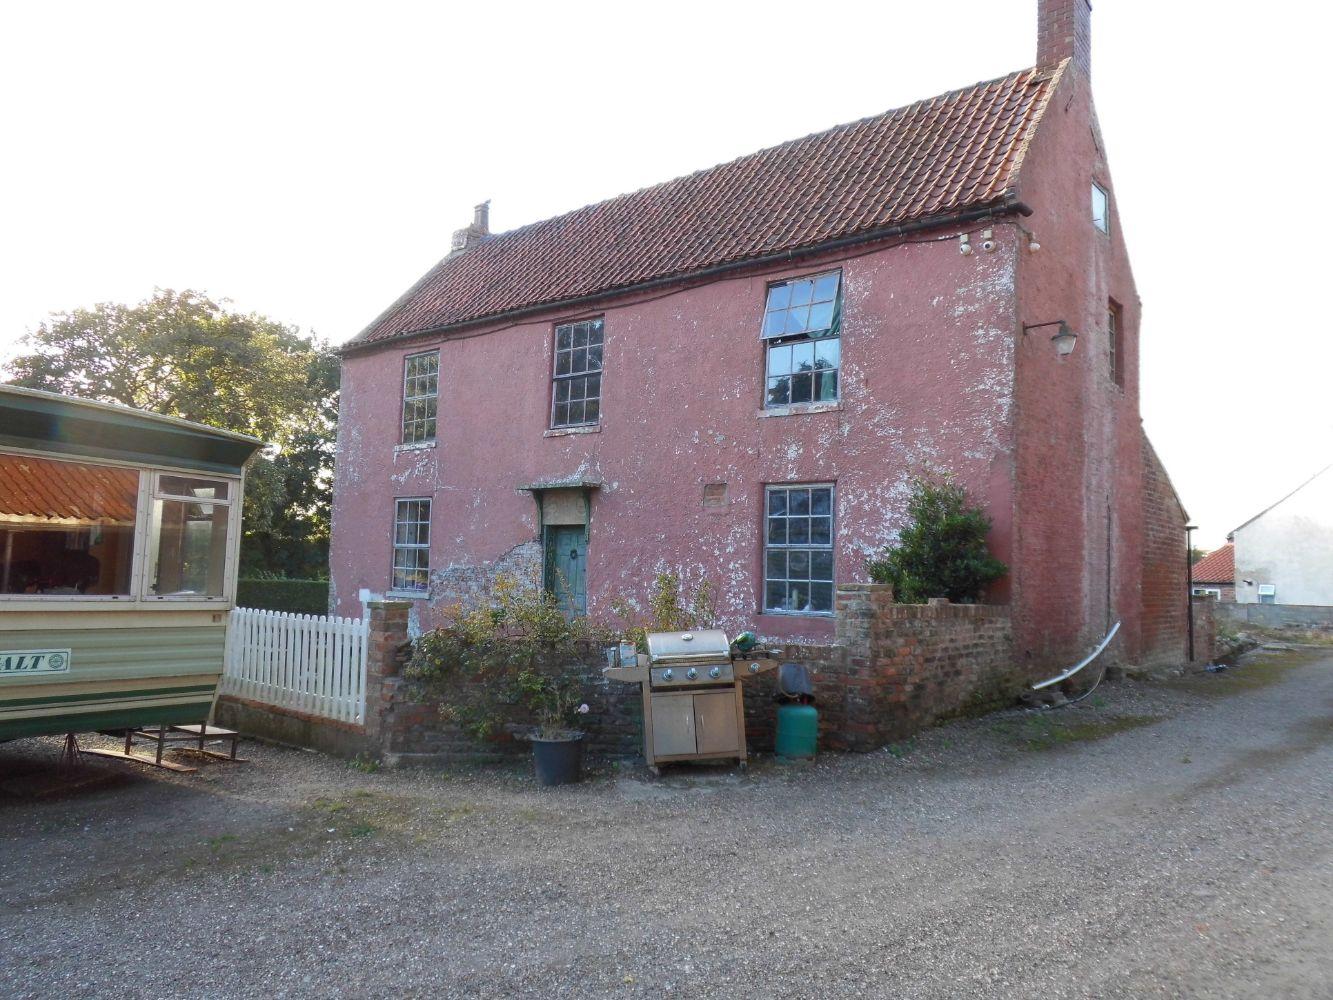 Auction of the Property Rectory Farm, Easington, Hull, HU12 0TN